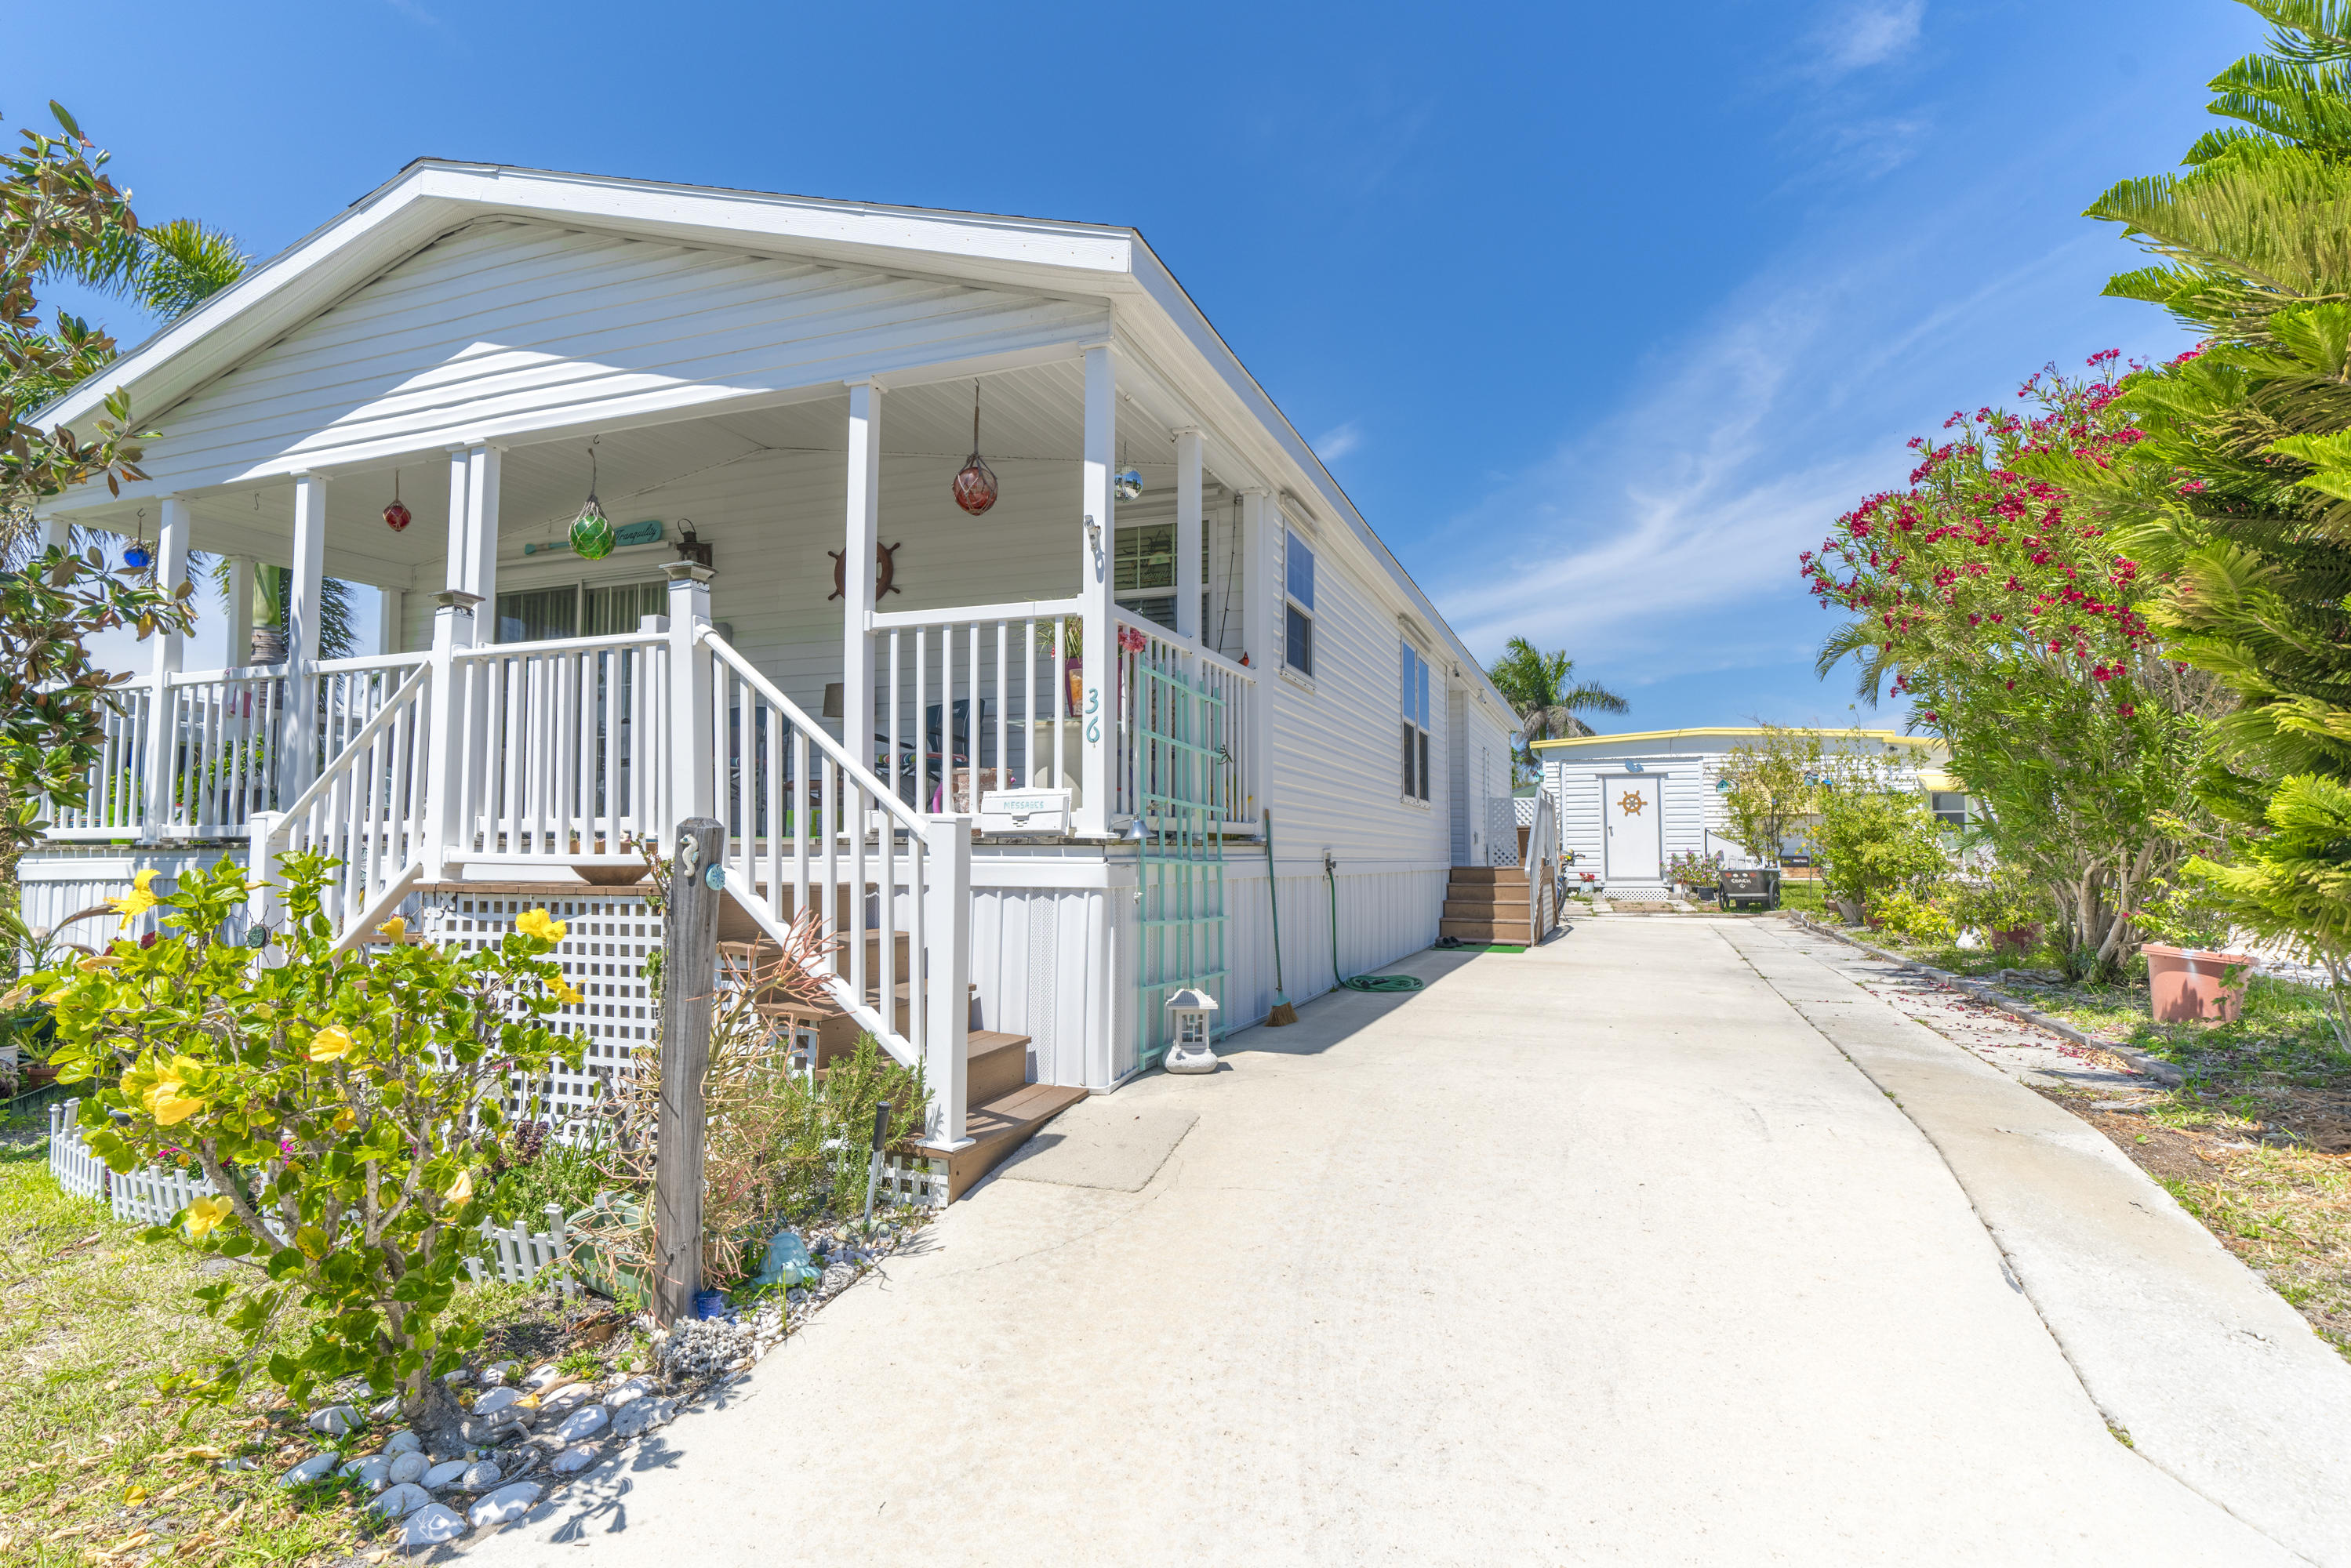 Beach Rental Properties New Jersey